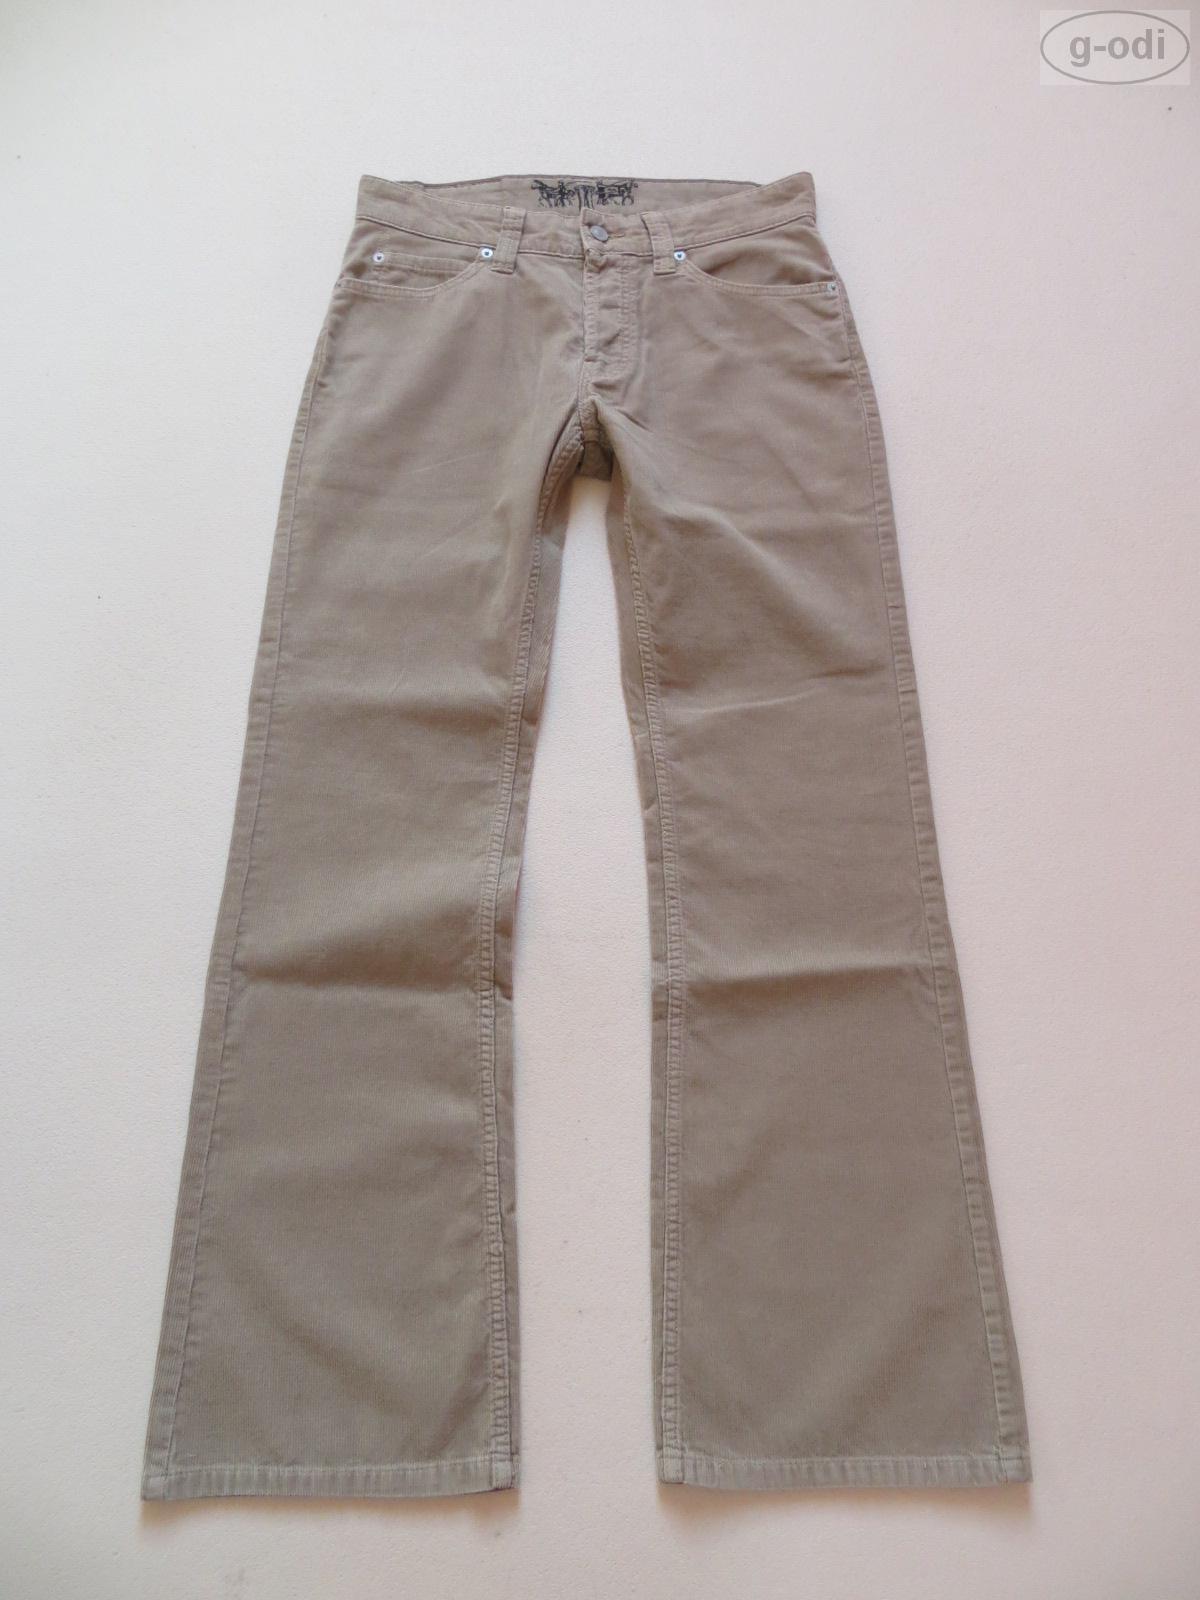 levi 39 s 512 cord bootcut jeans pantaloni w 31 l 32 beige come nuovo cord pantaloni rar ebay. Black Bedroom Furniture Sets. Home Design Ideas